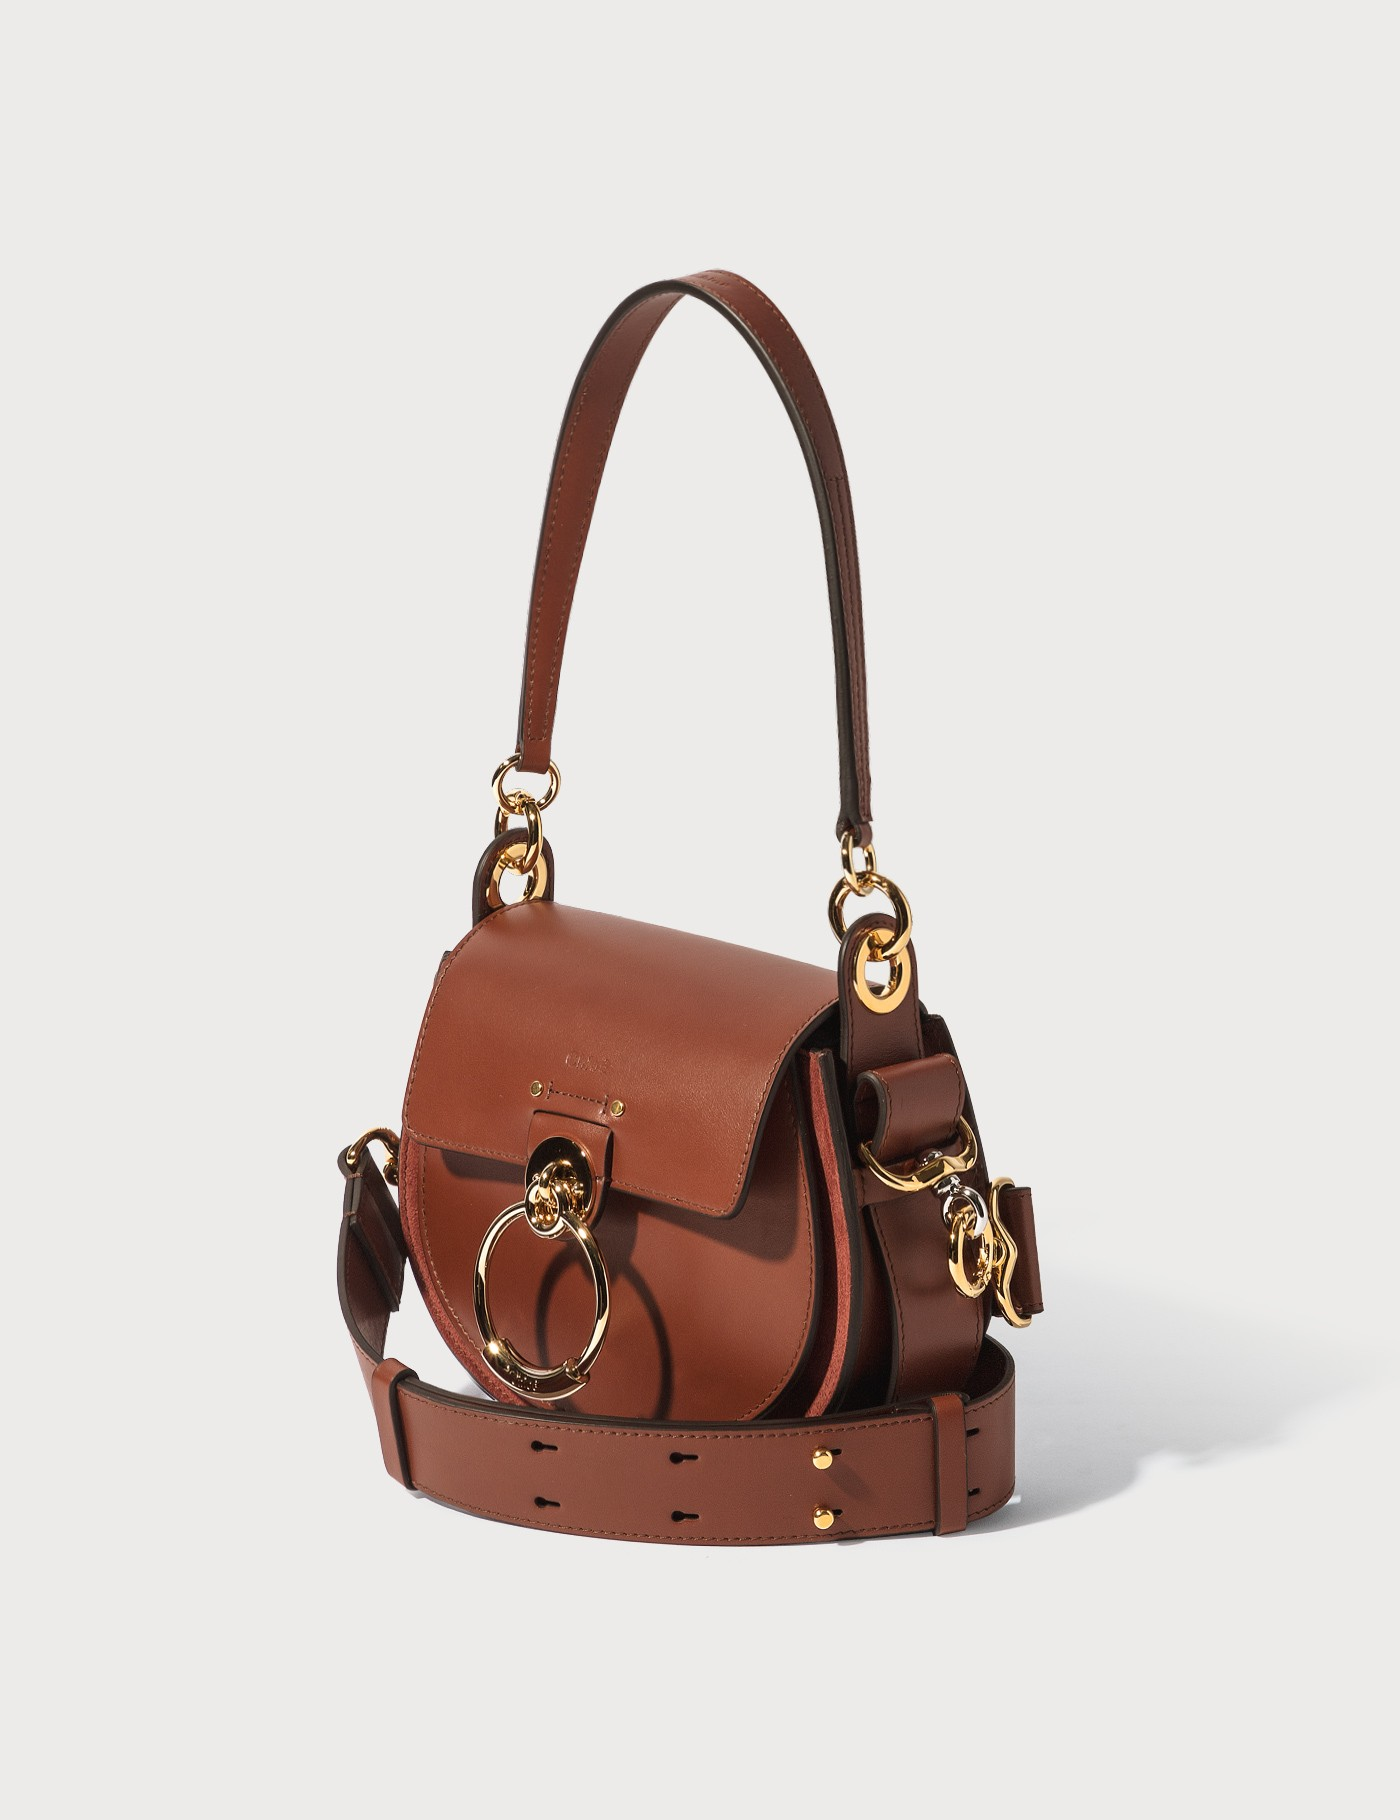 Chloé Small Tess Bag In Brown